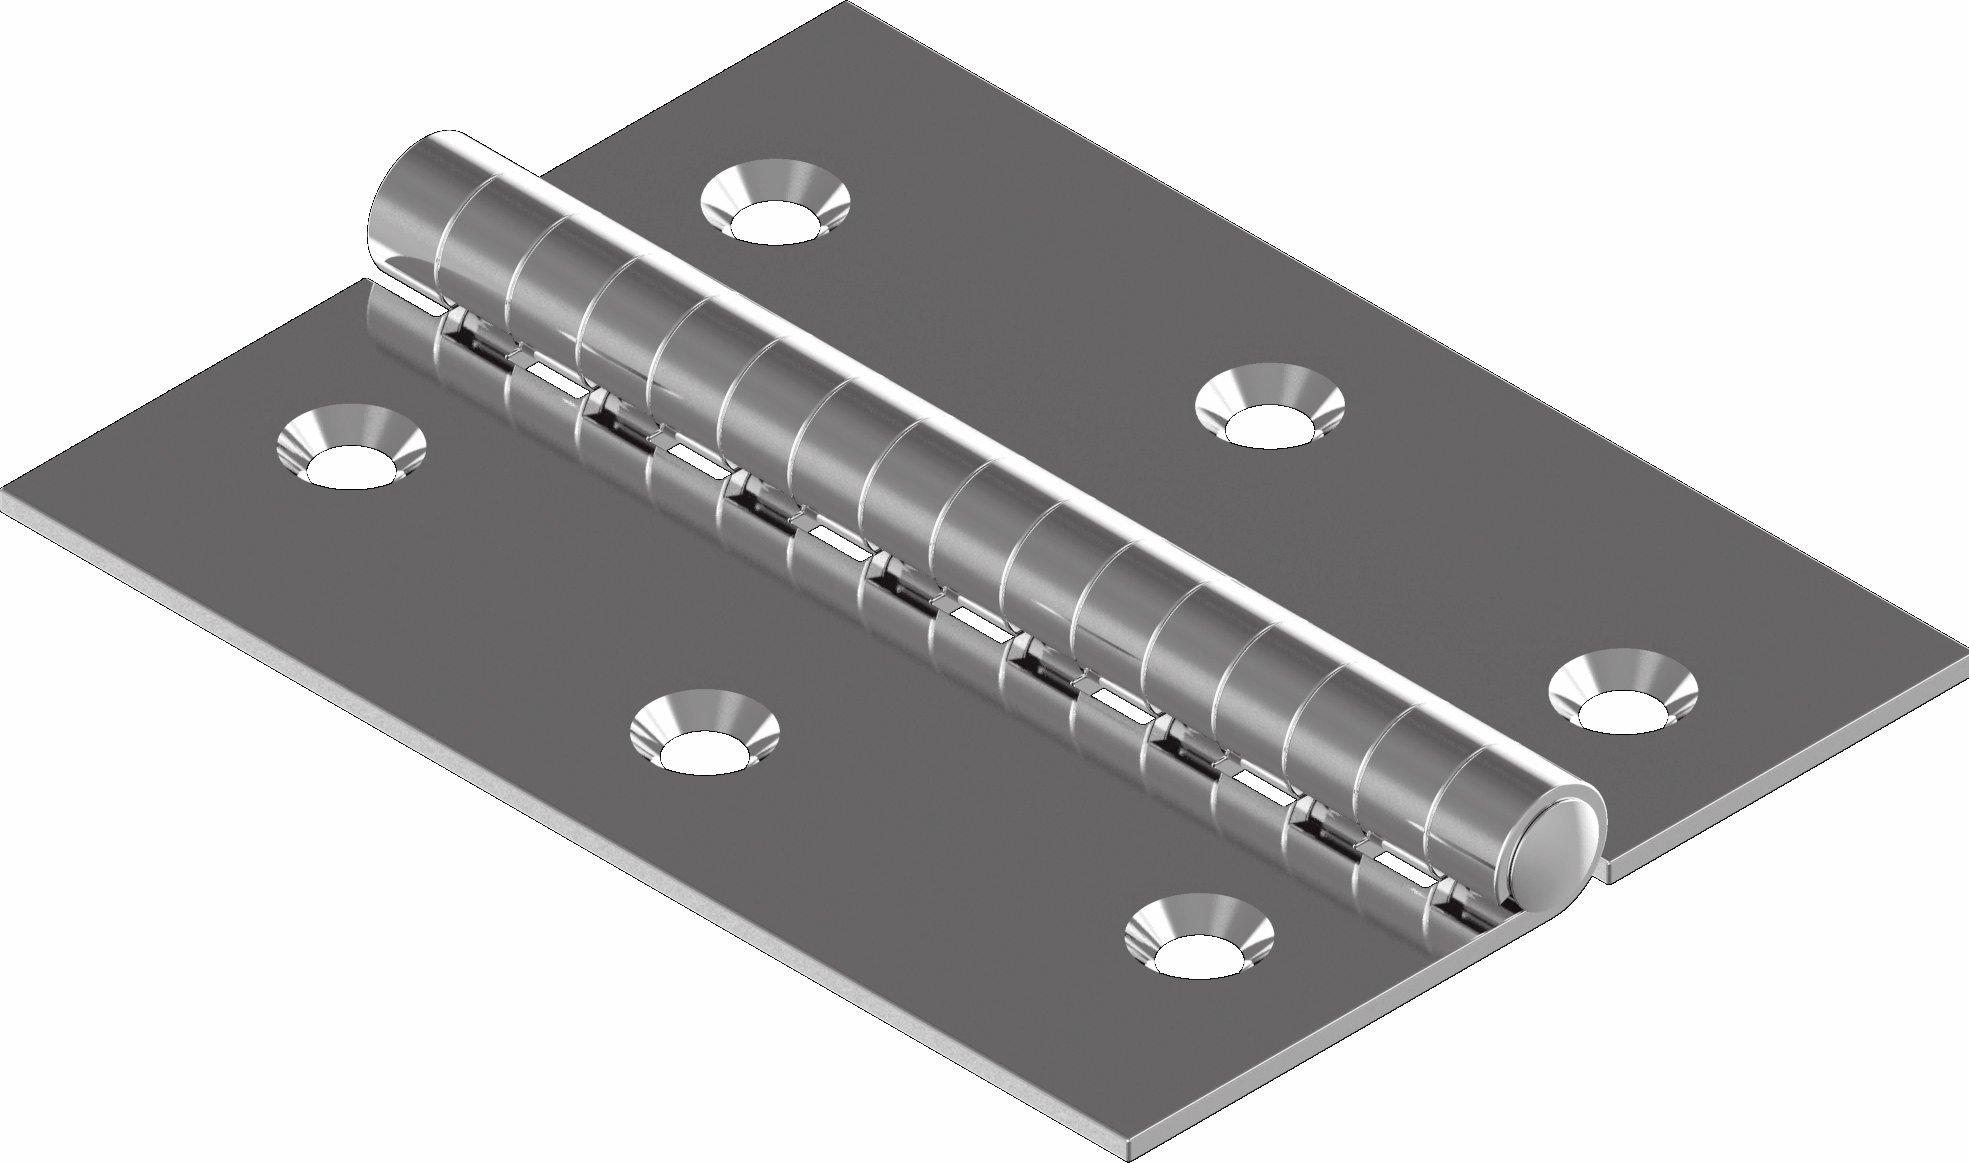 Scharnier Edelstahl A2 gestanzt 60 x 60 ARBO-INOX | ARBO-INOX